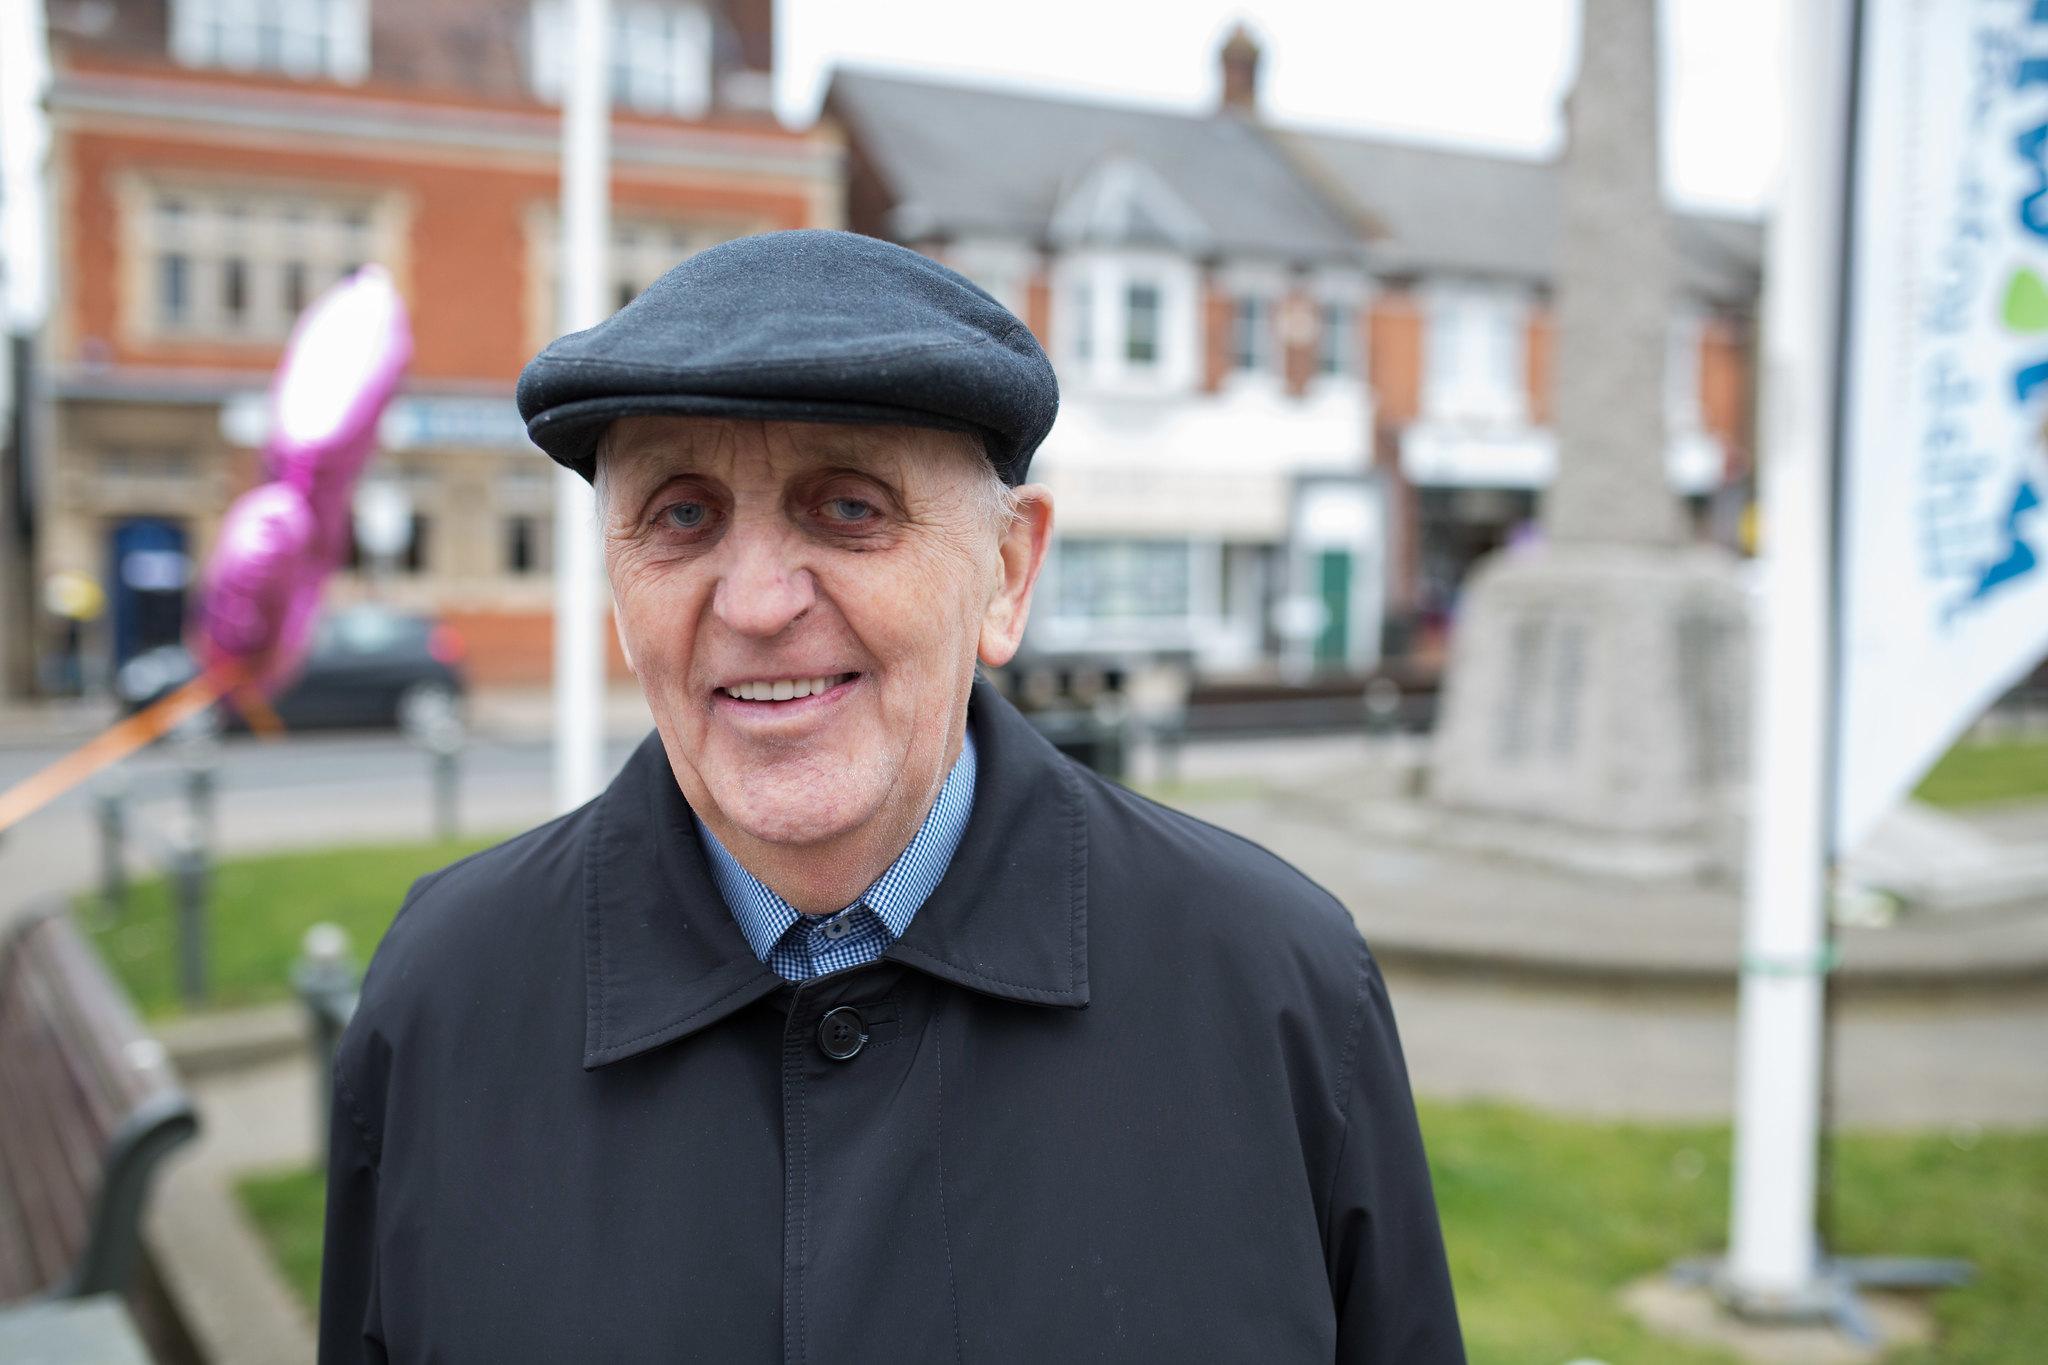 Elderly man smiling at the camera